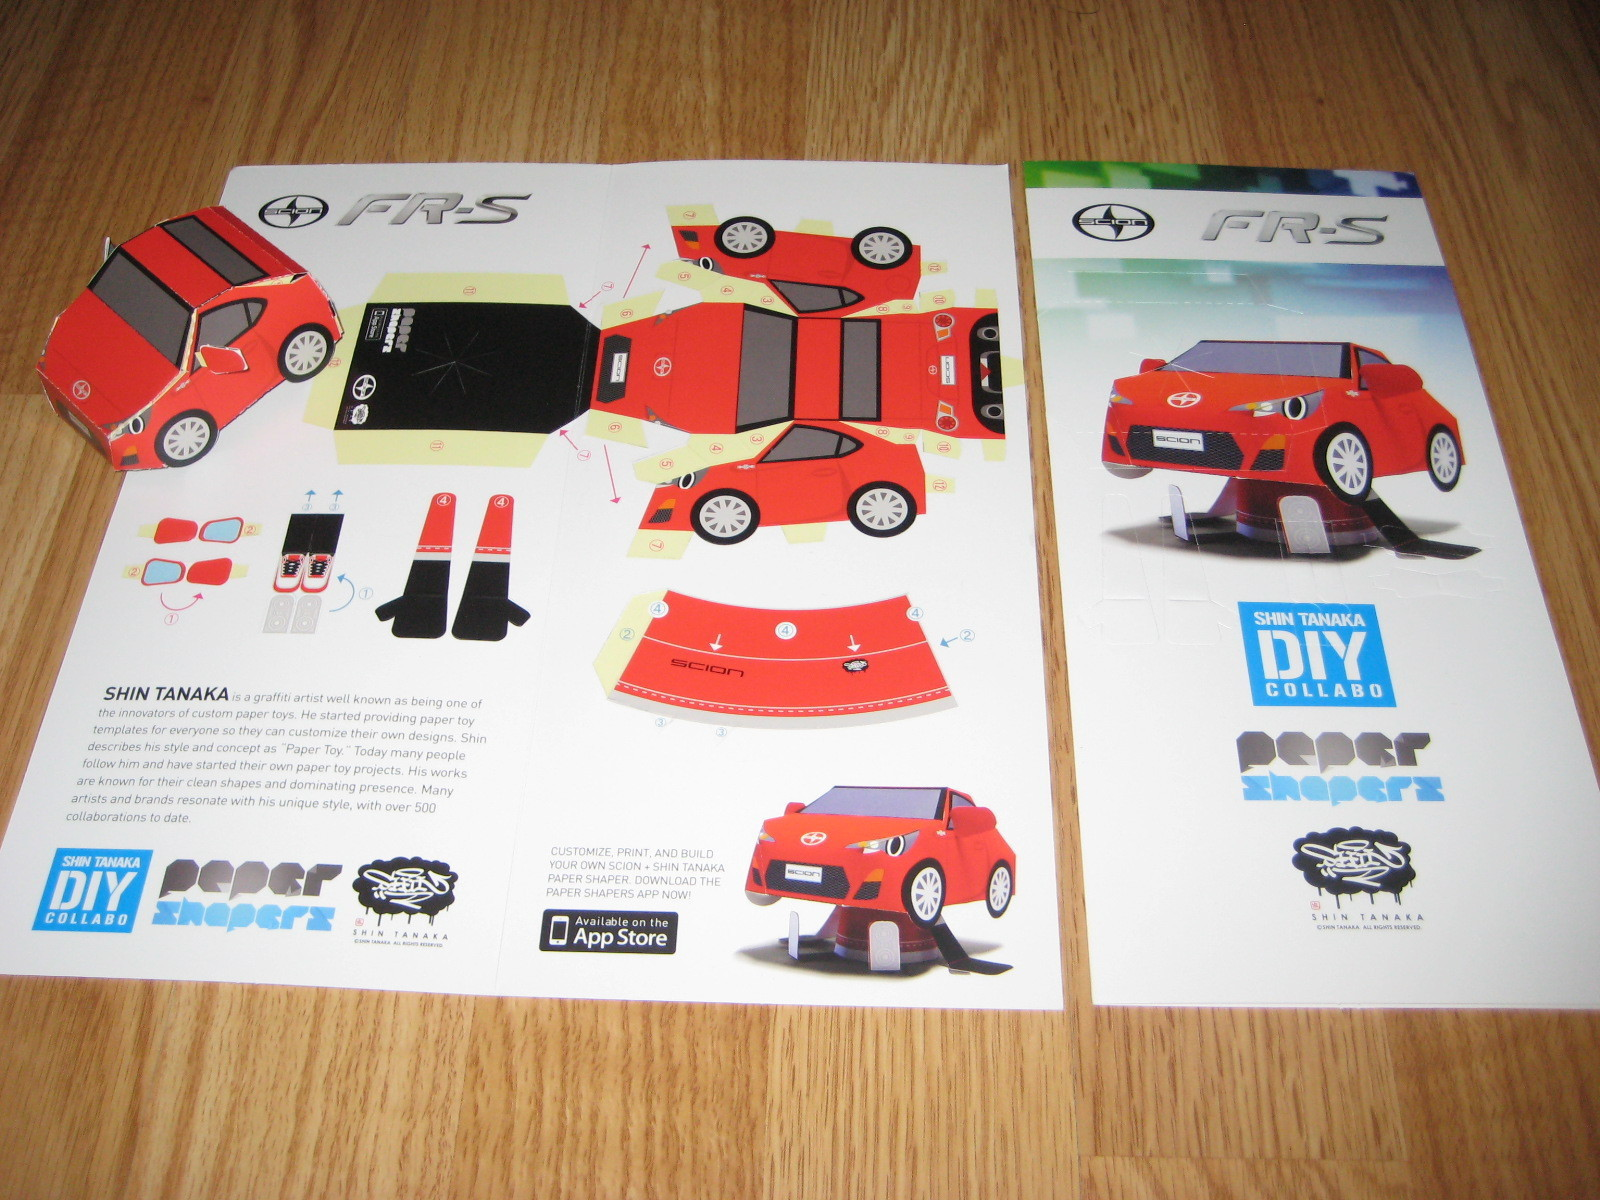 2013 Scion tC Shin Tanaka DIY PAPER SHAPERS brochure catalog US Toyota